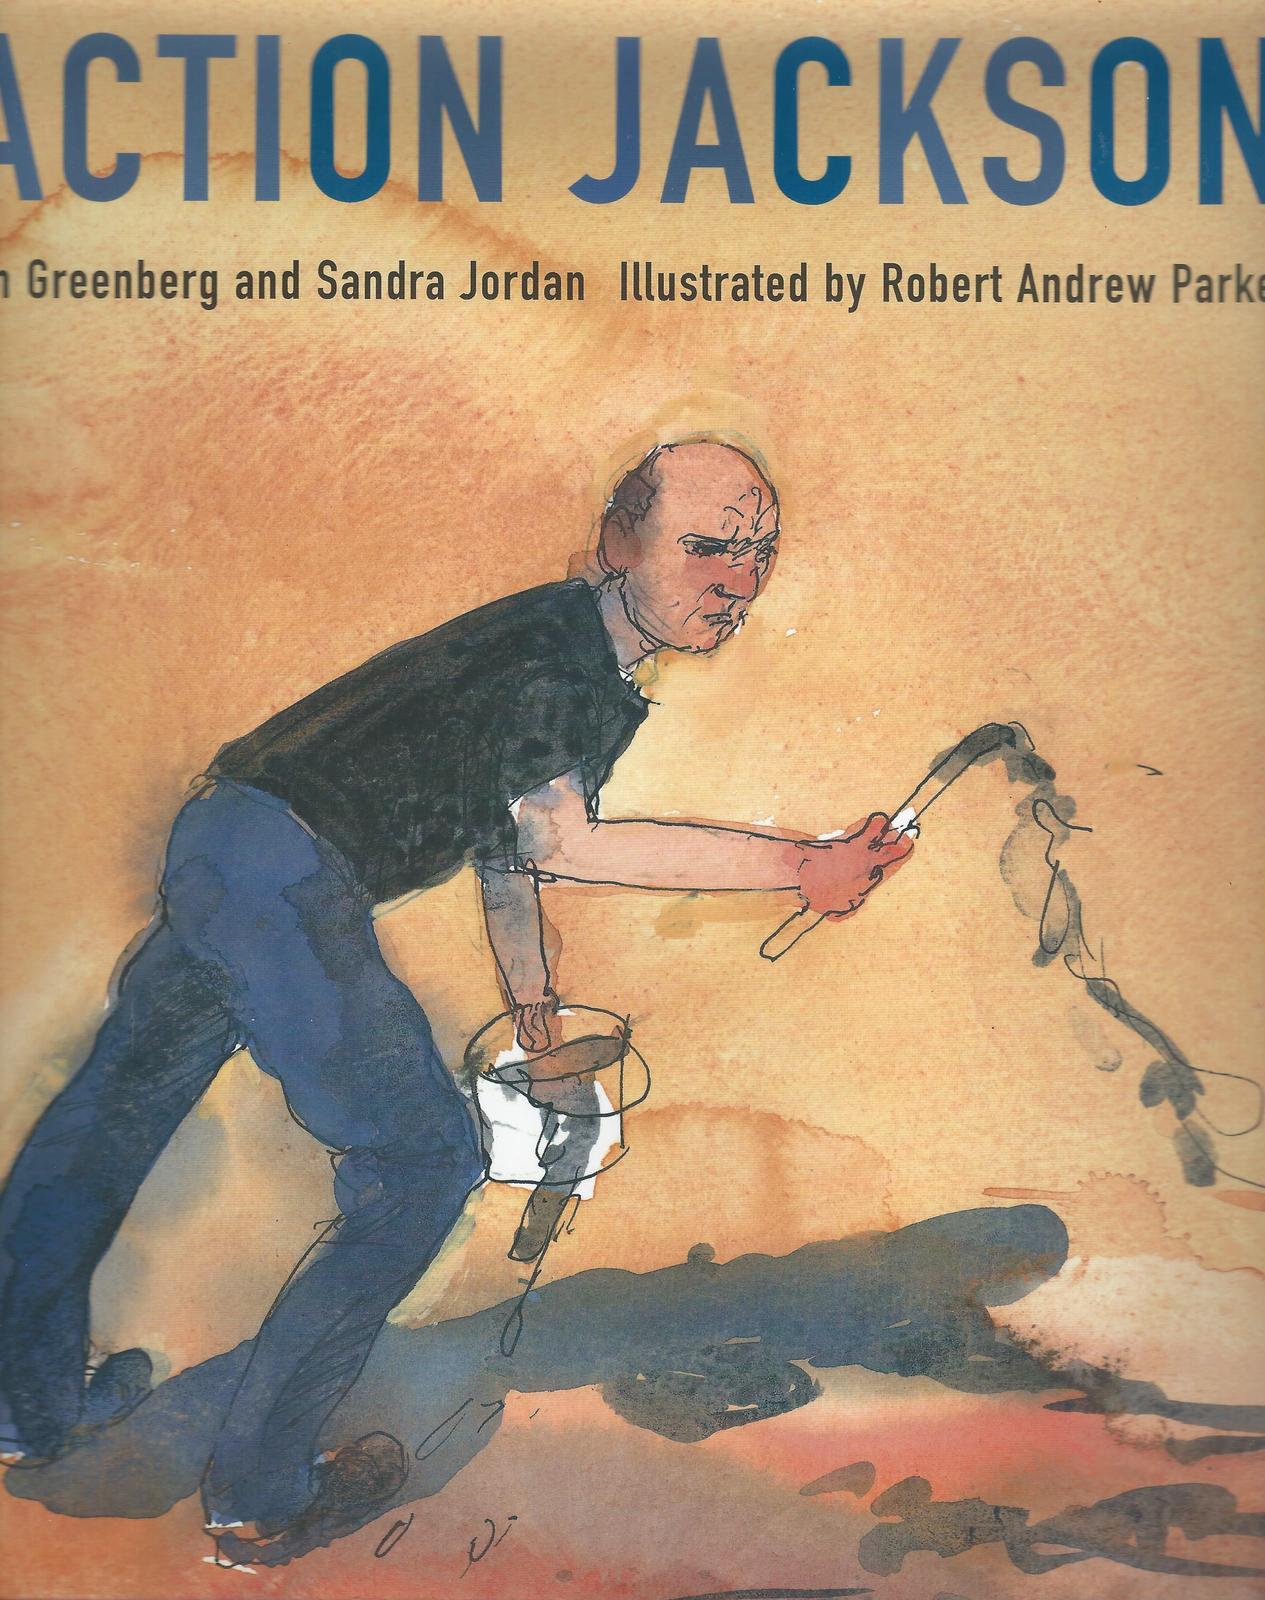 Action jackson 001